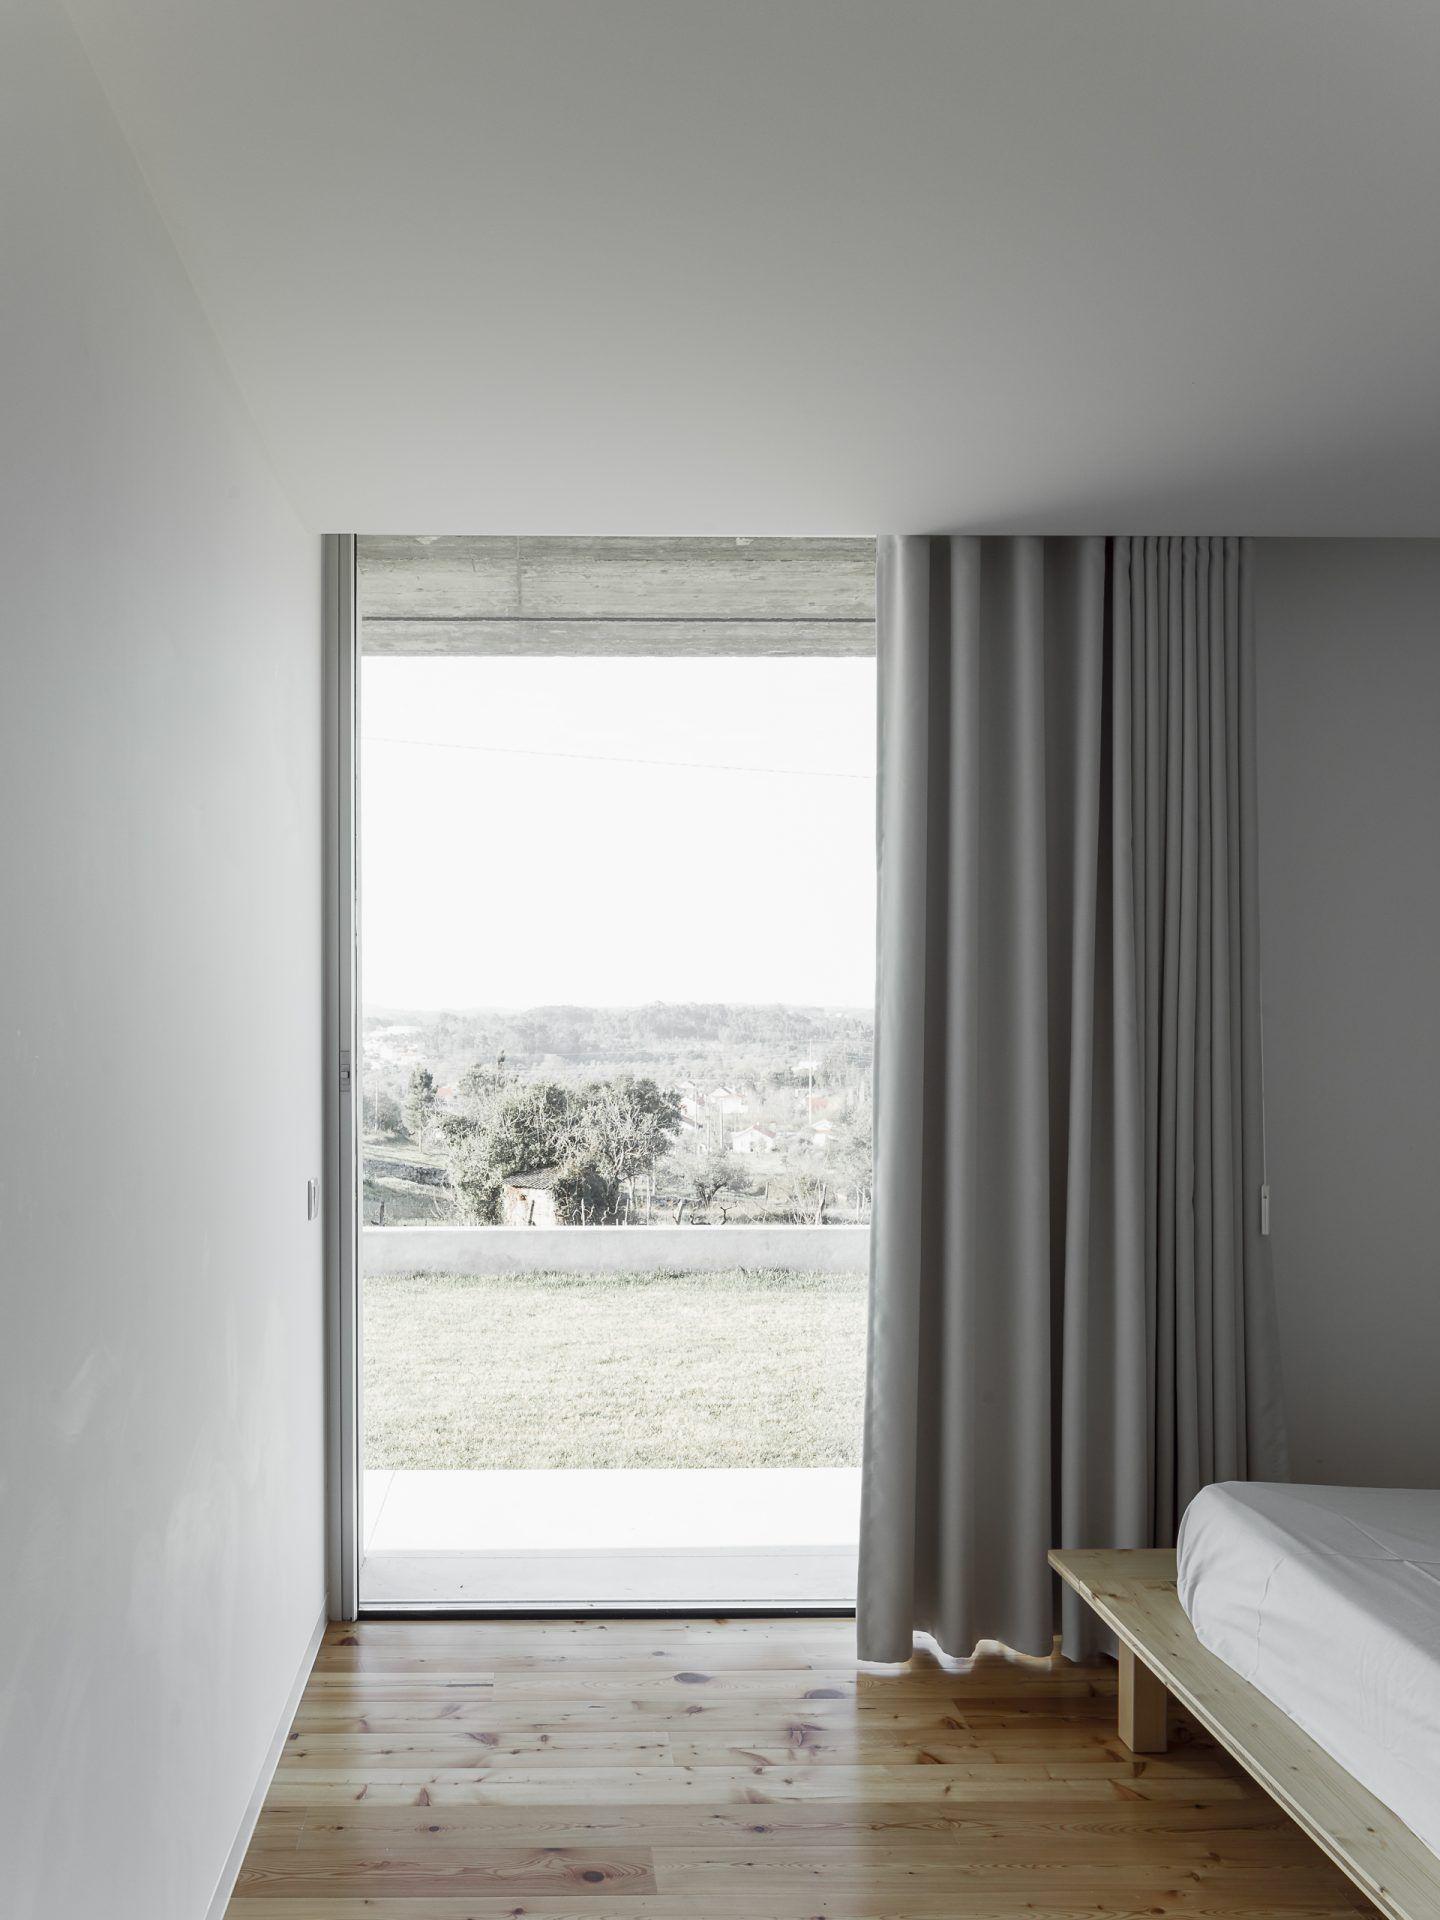 IGNANT-Architecture-BDArquitectura-Gloma-House-014